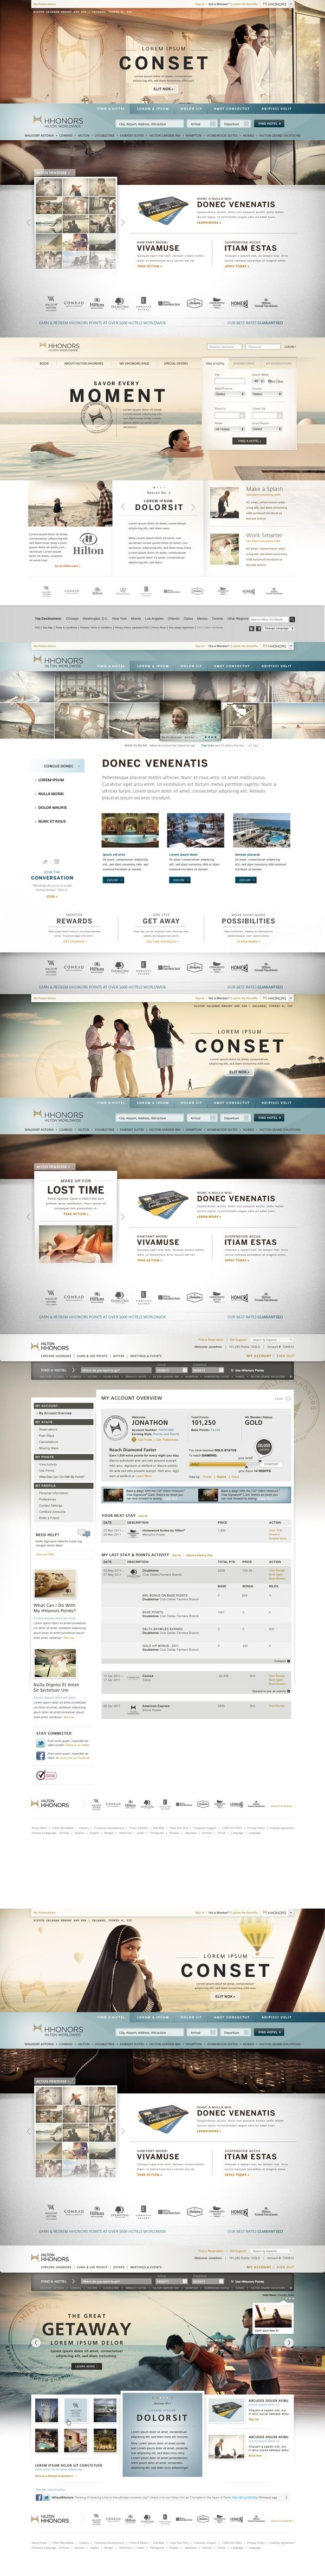 Hilton HHonors on Web Design Served